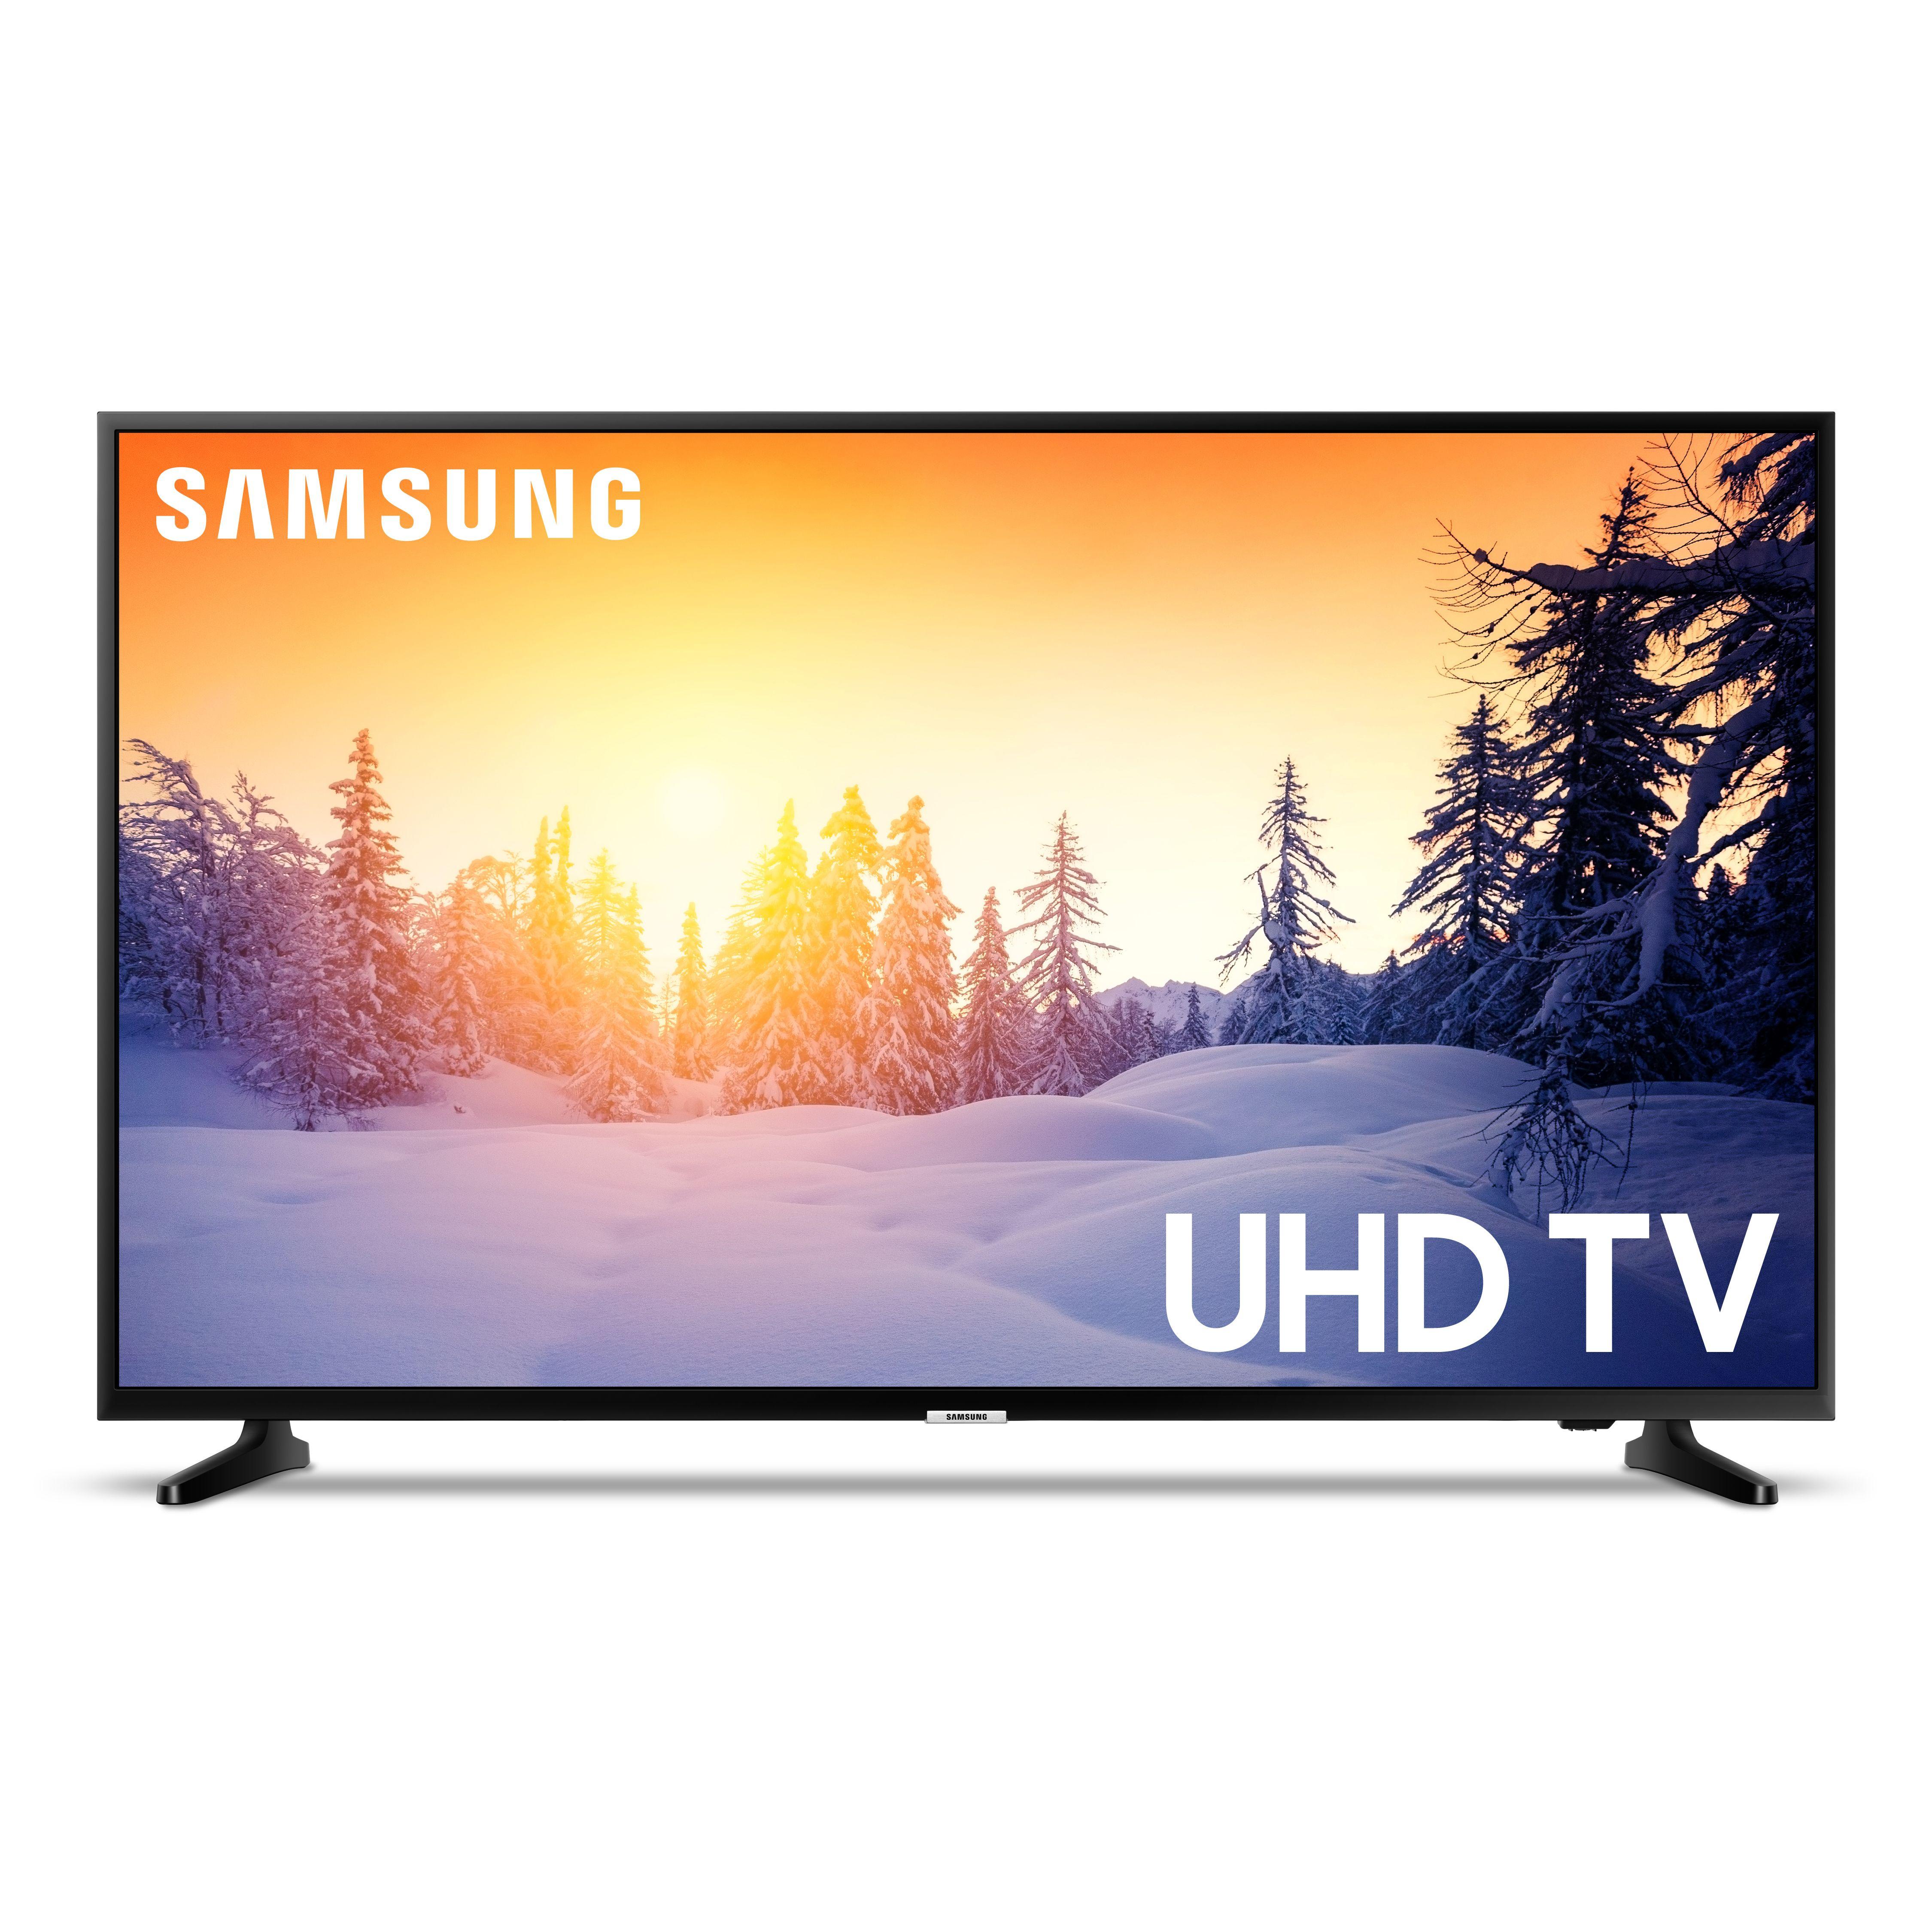 Samsung 65 Class 4k Uhd 2160p Led Smart Tv With Hdr Un65nu6900 Walmart Com Samsung Tvs Uhd Tv Smart Tv